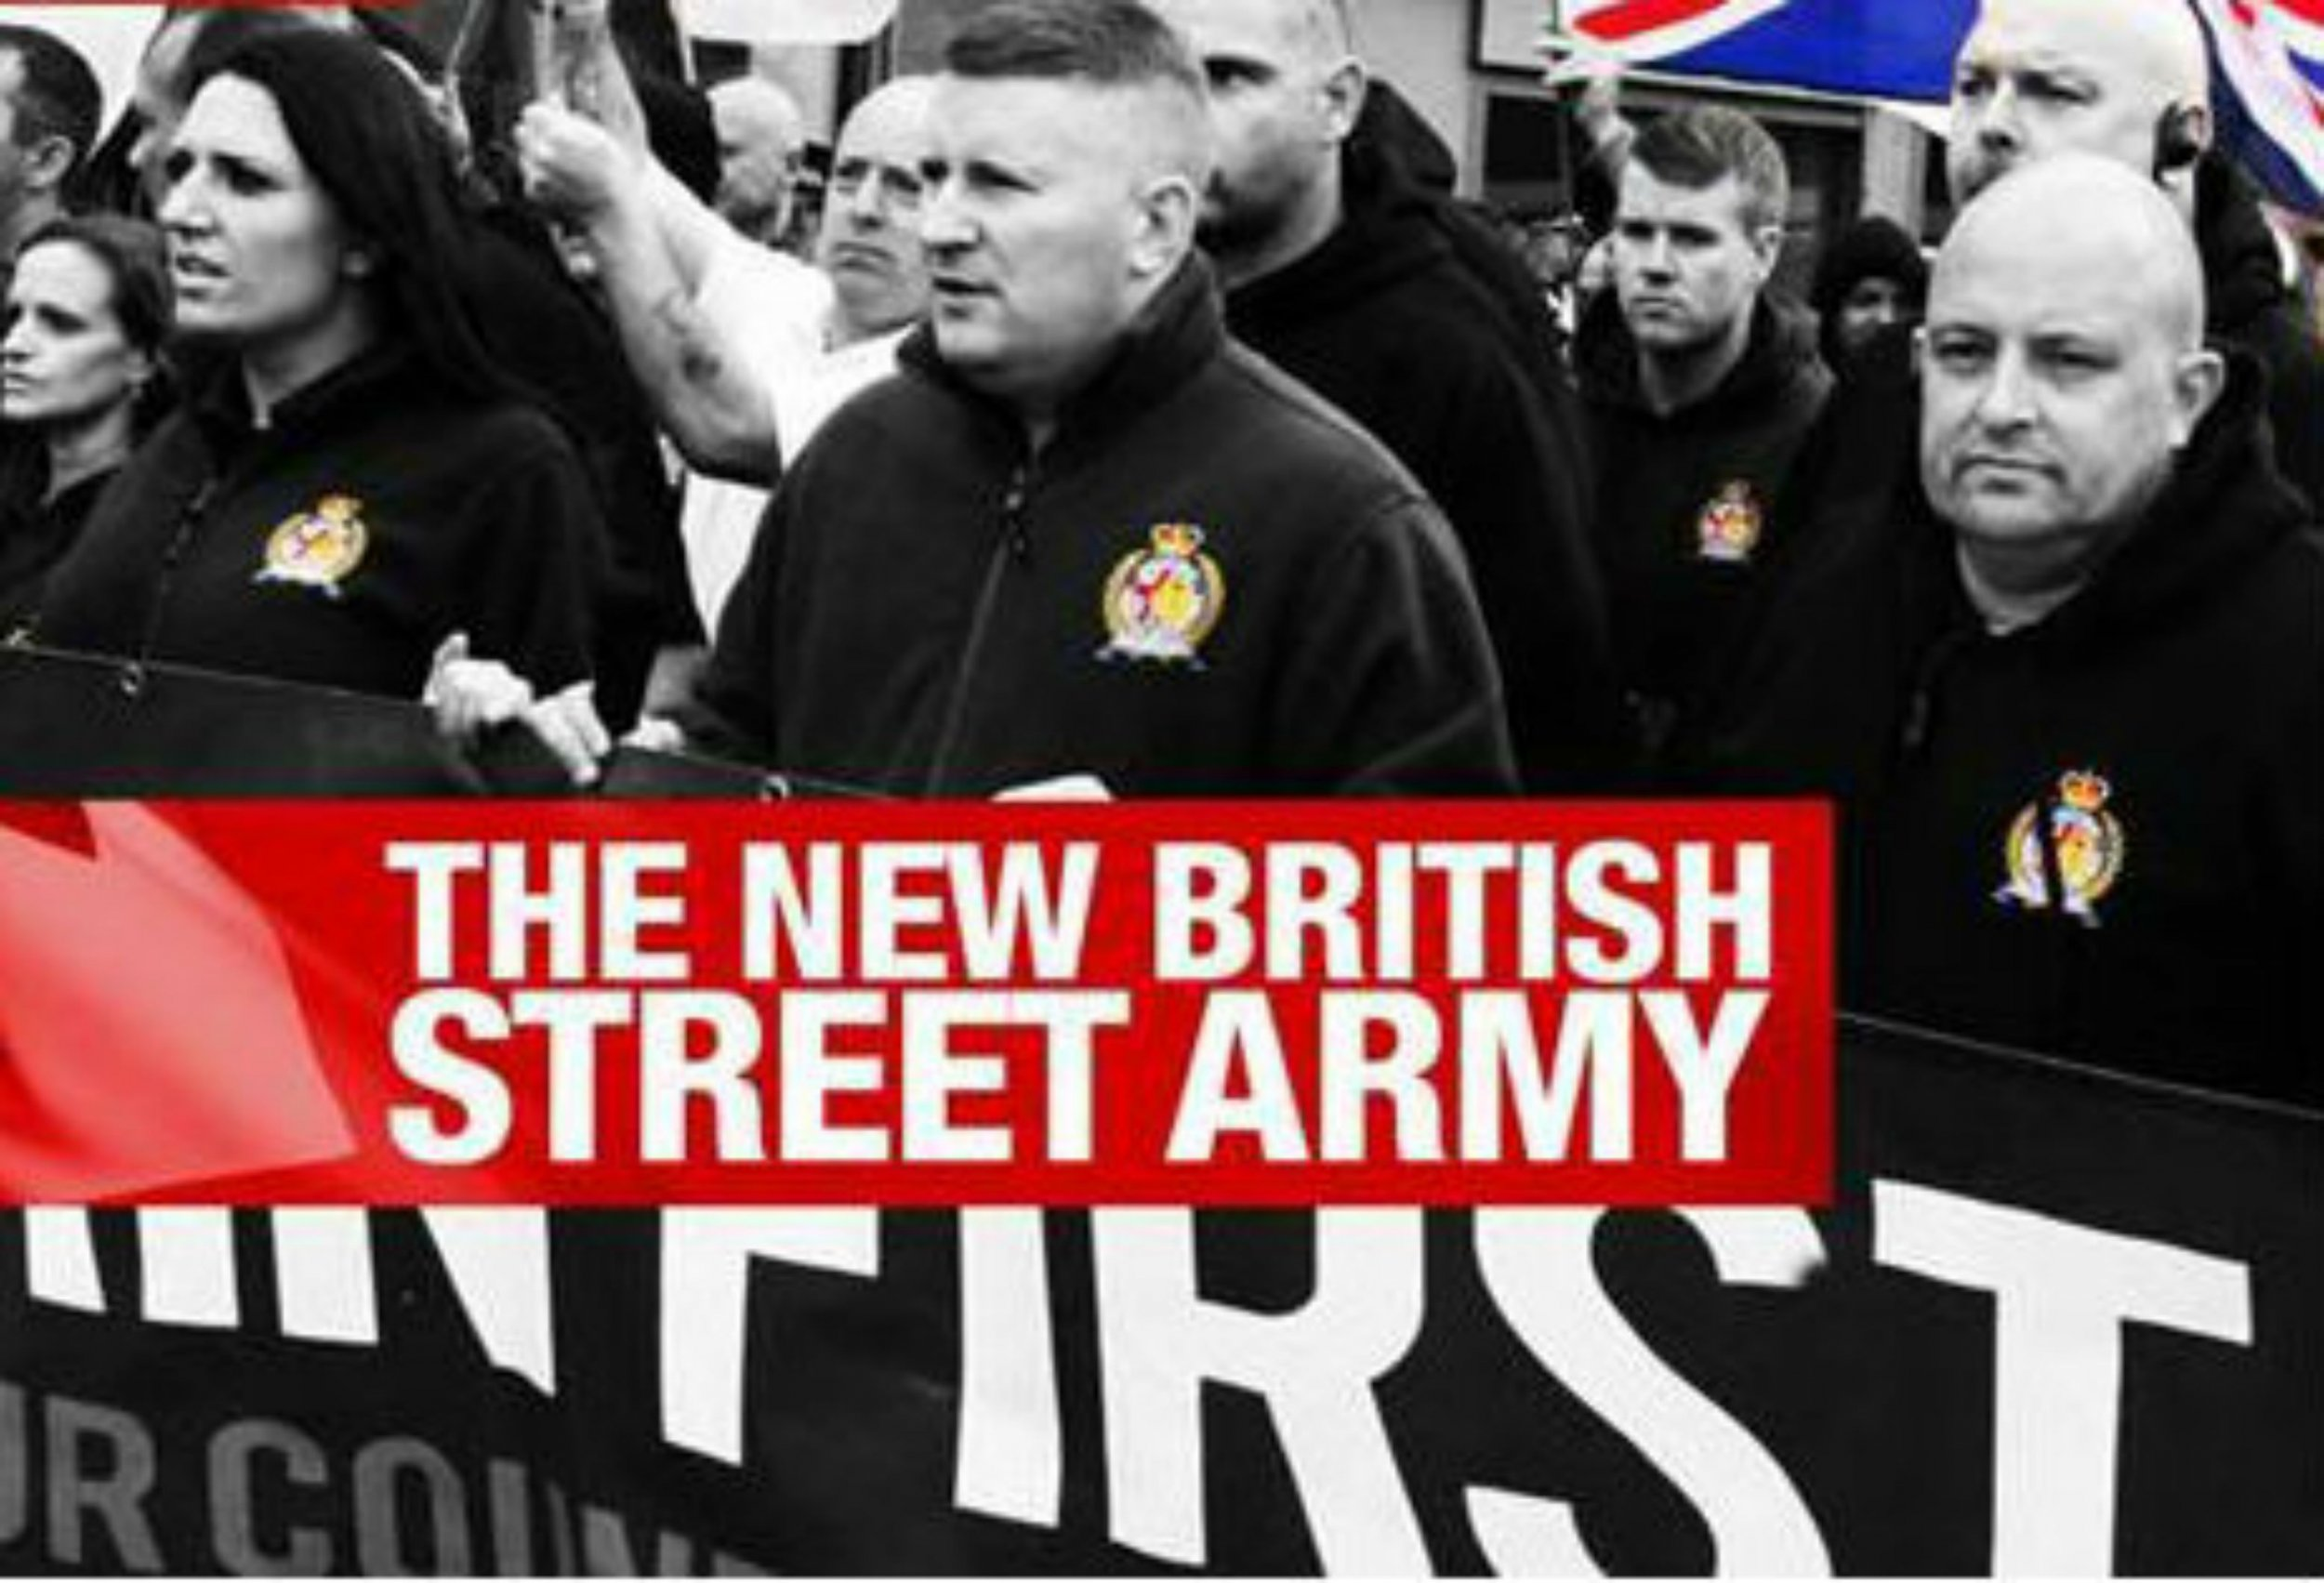 British Street Army